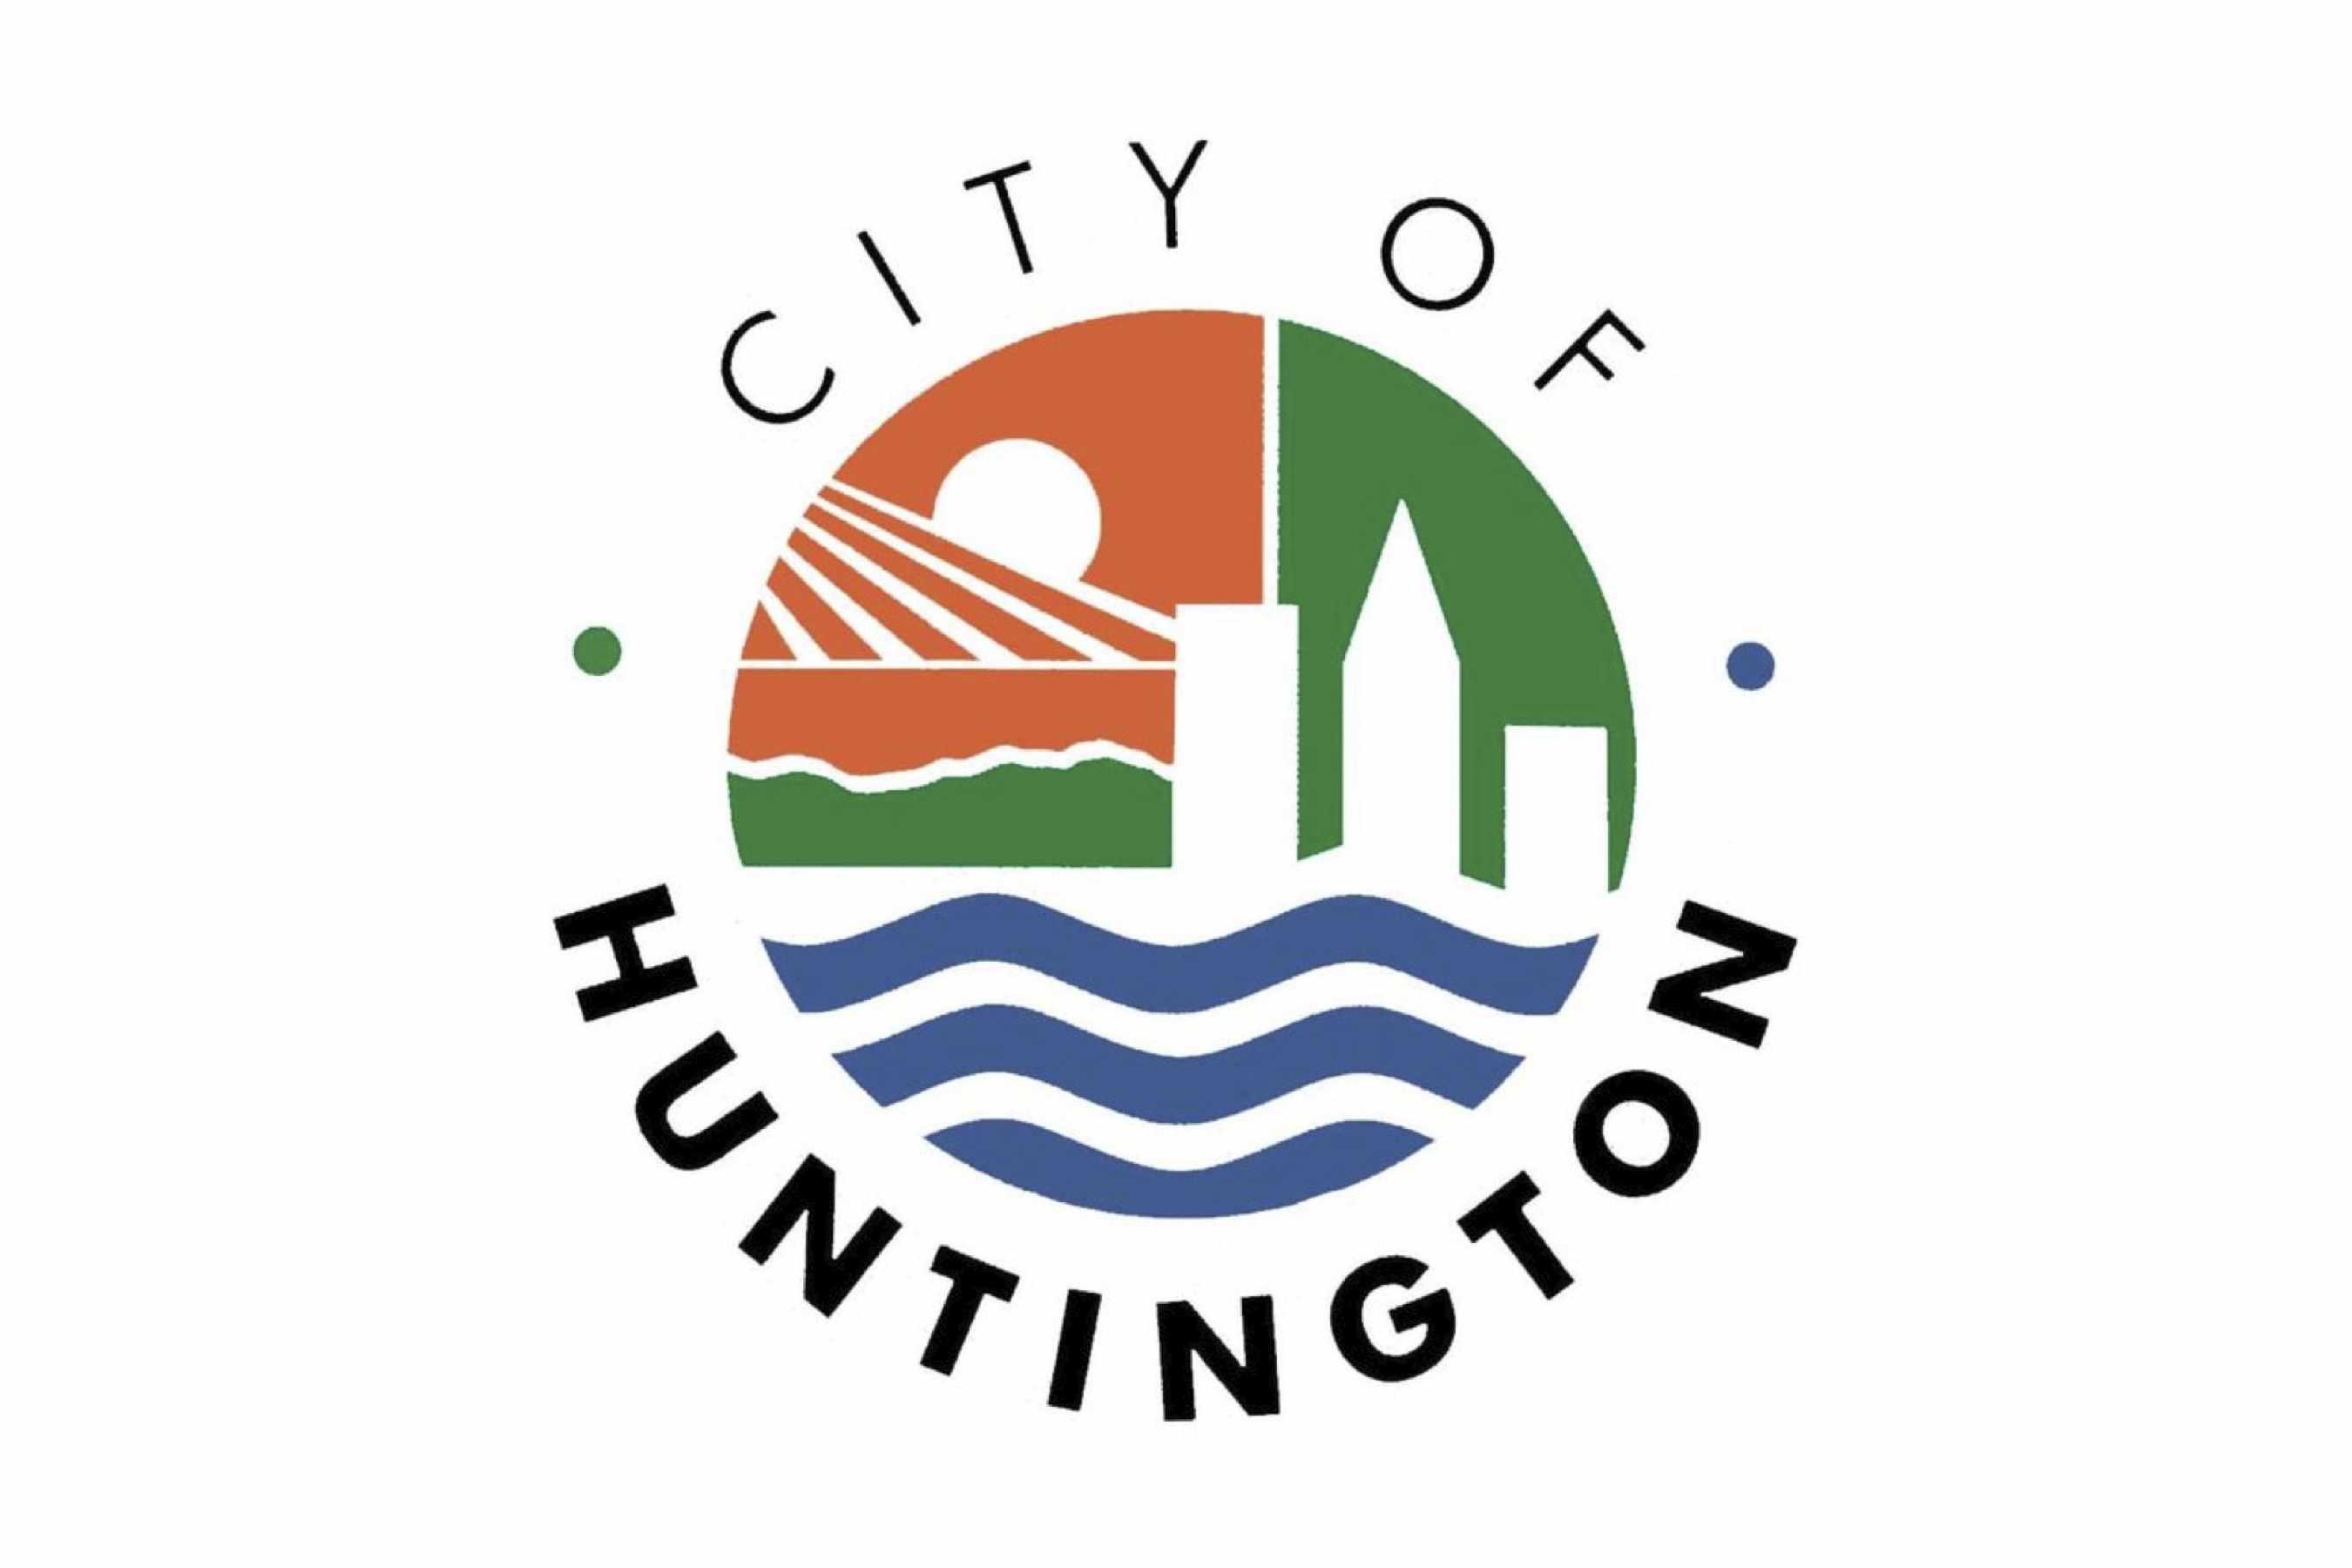 Bandera Huntington, Virginia Occidental